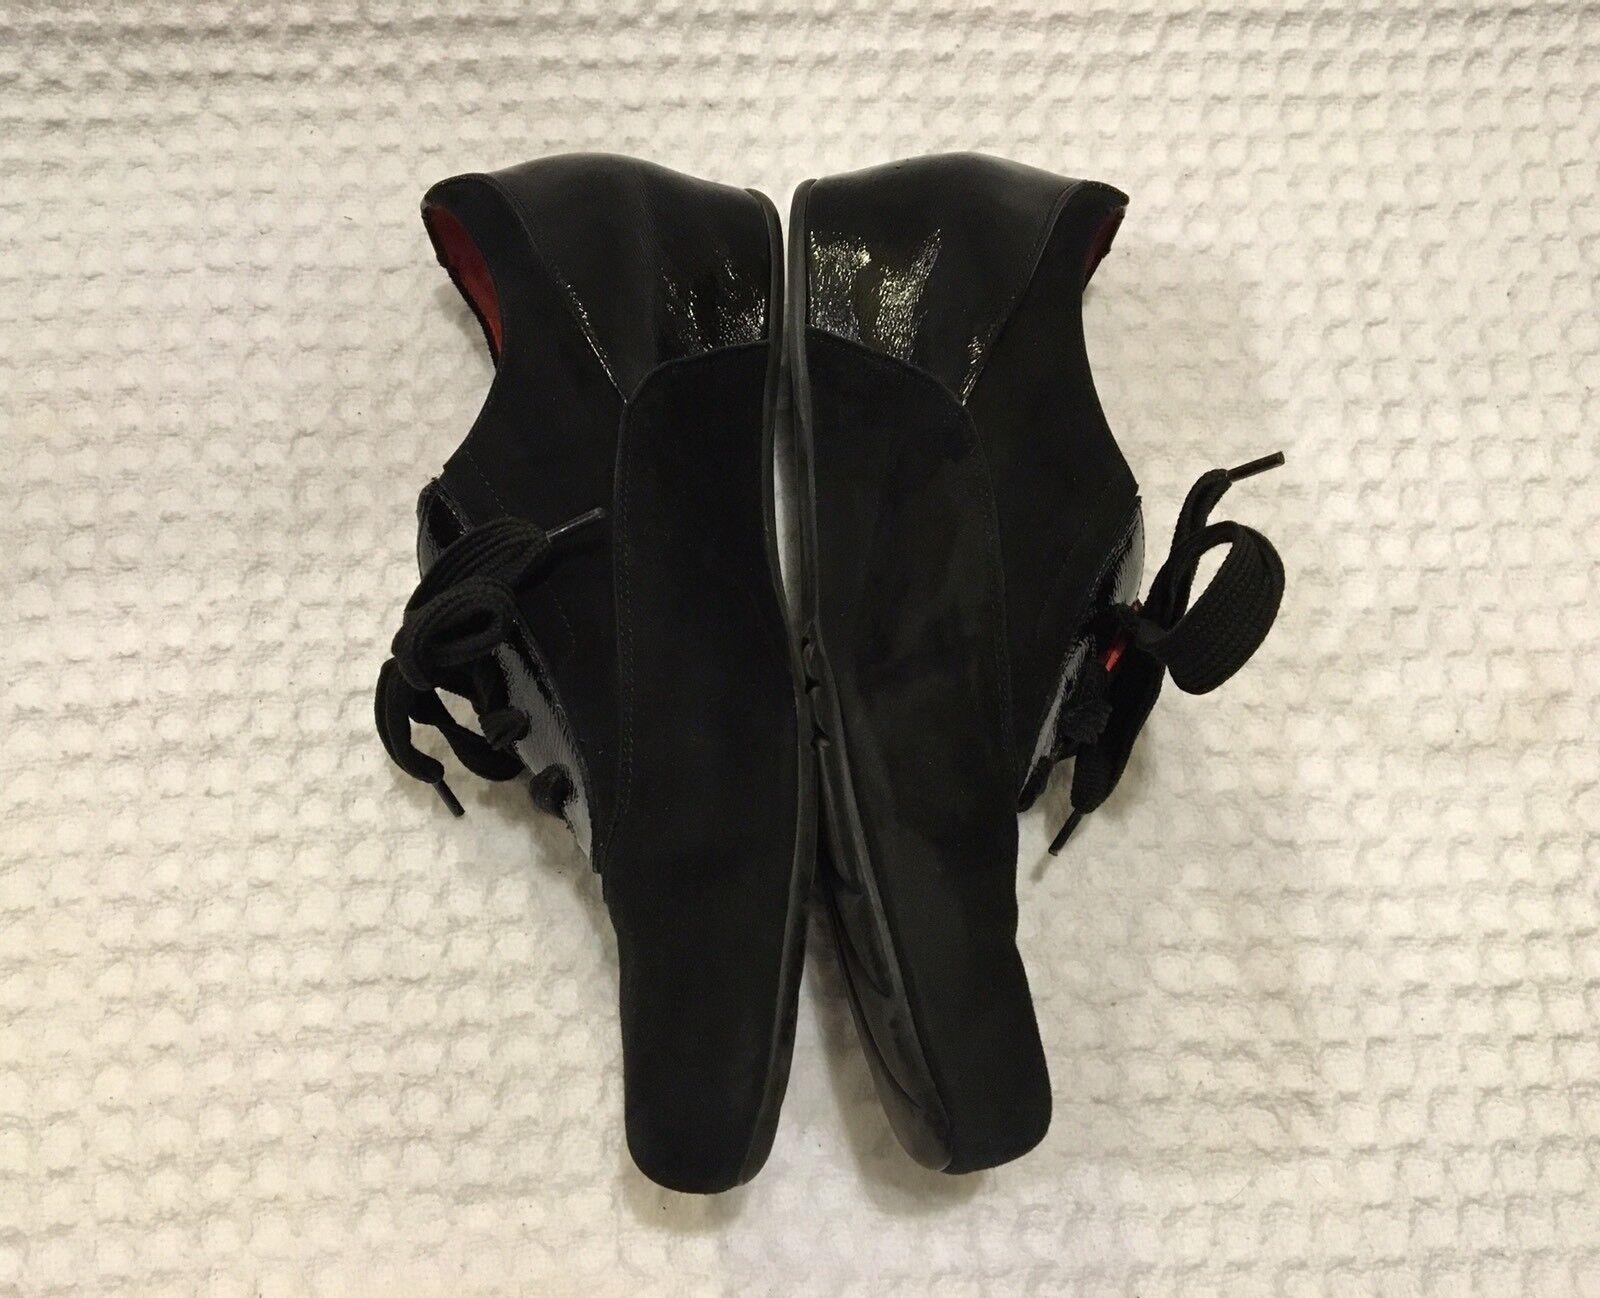 PAS DE red Oxfords Loafers Lace-up Oxford shoes shoes shoes  440 Black Suede 41   11 ee0b47